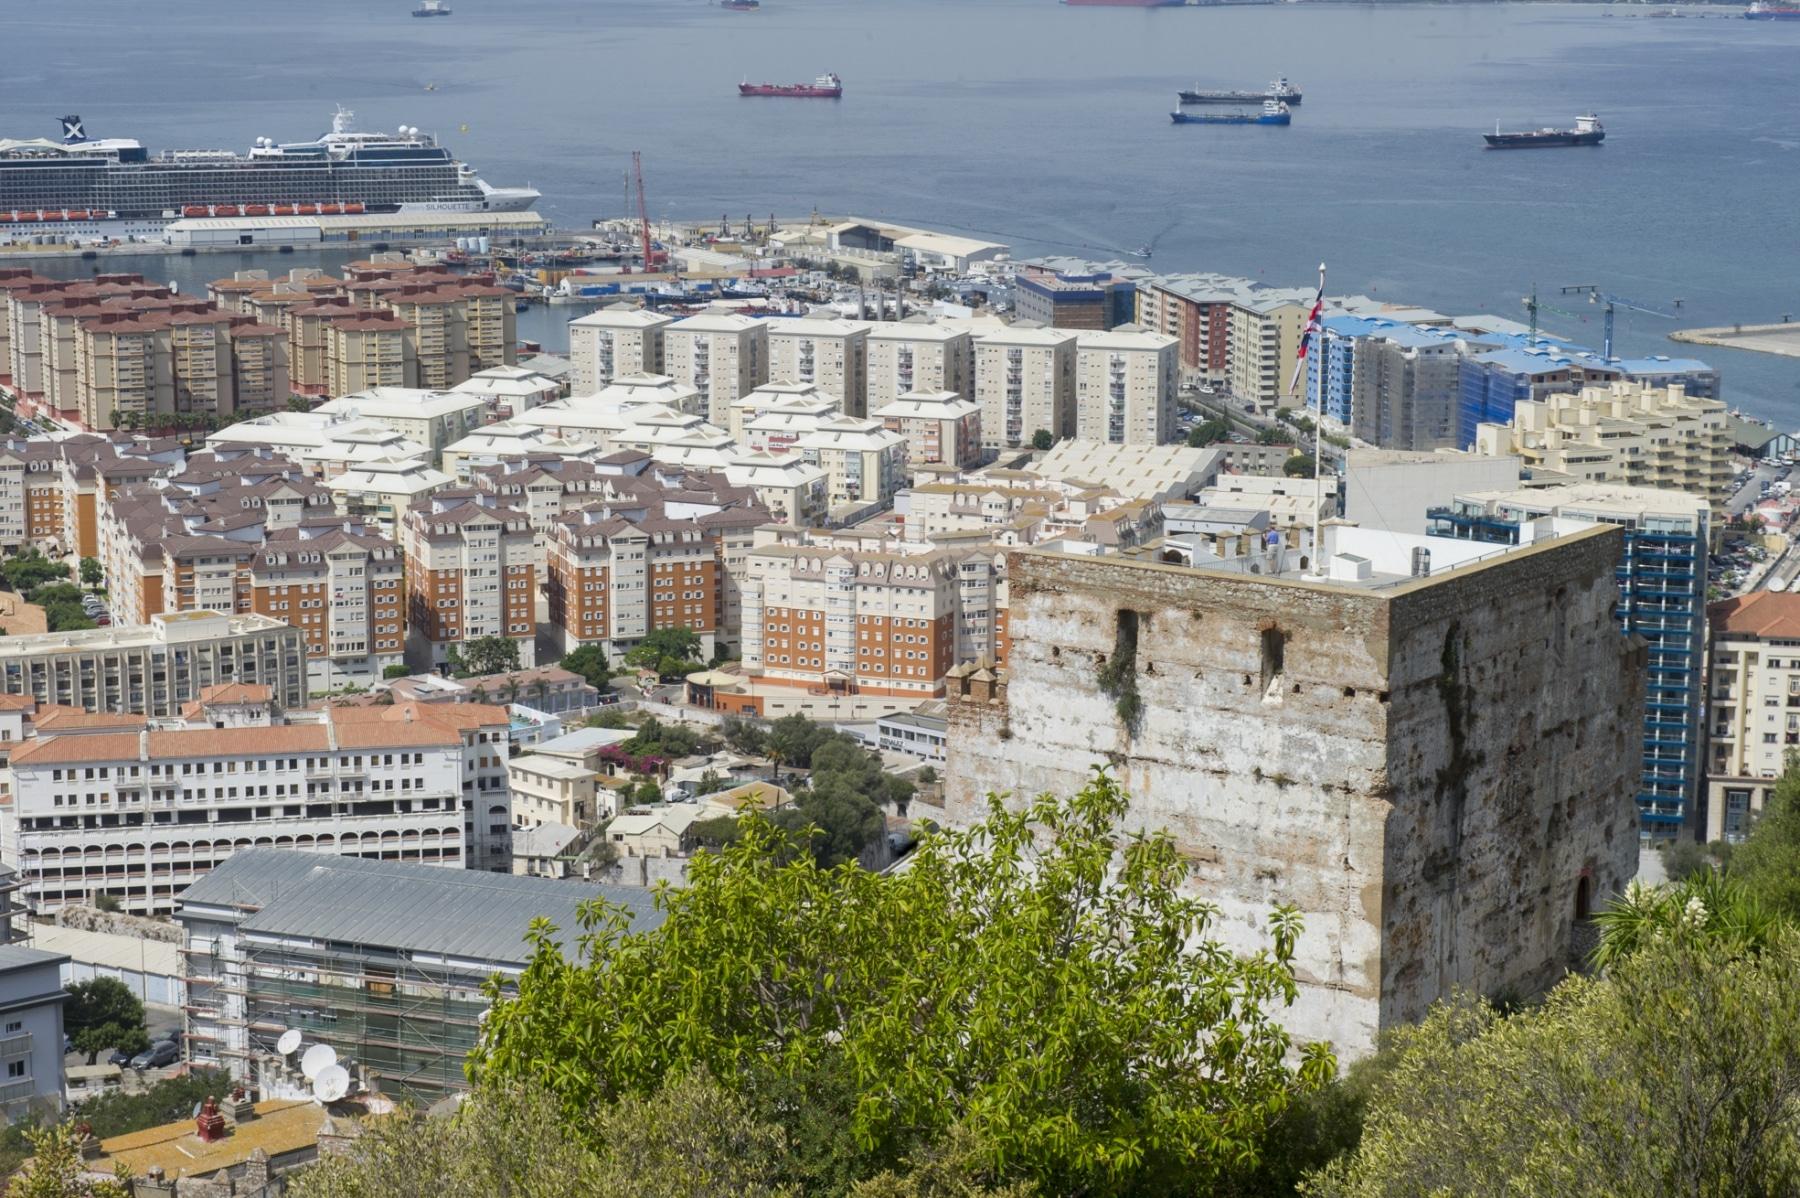 vistas-desde-el-castillo-moro-de-gibraltar_22740349645_o